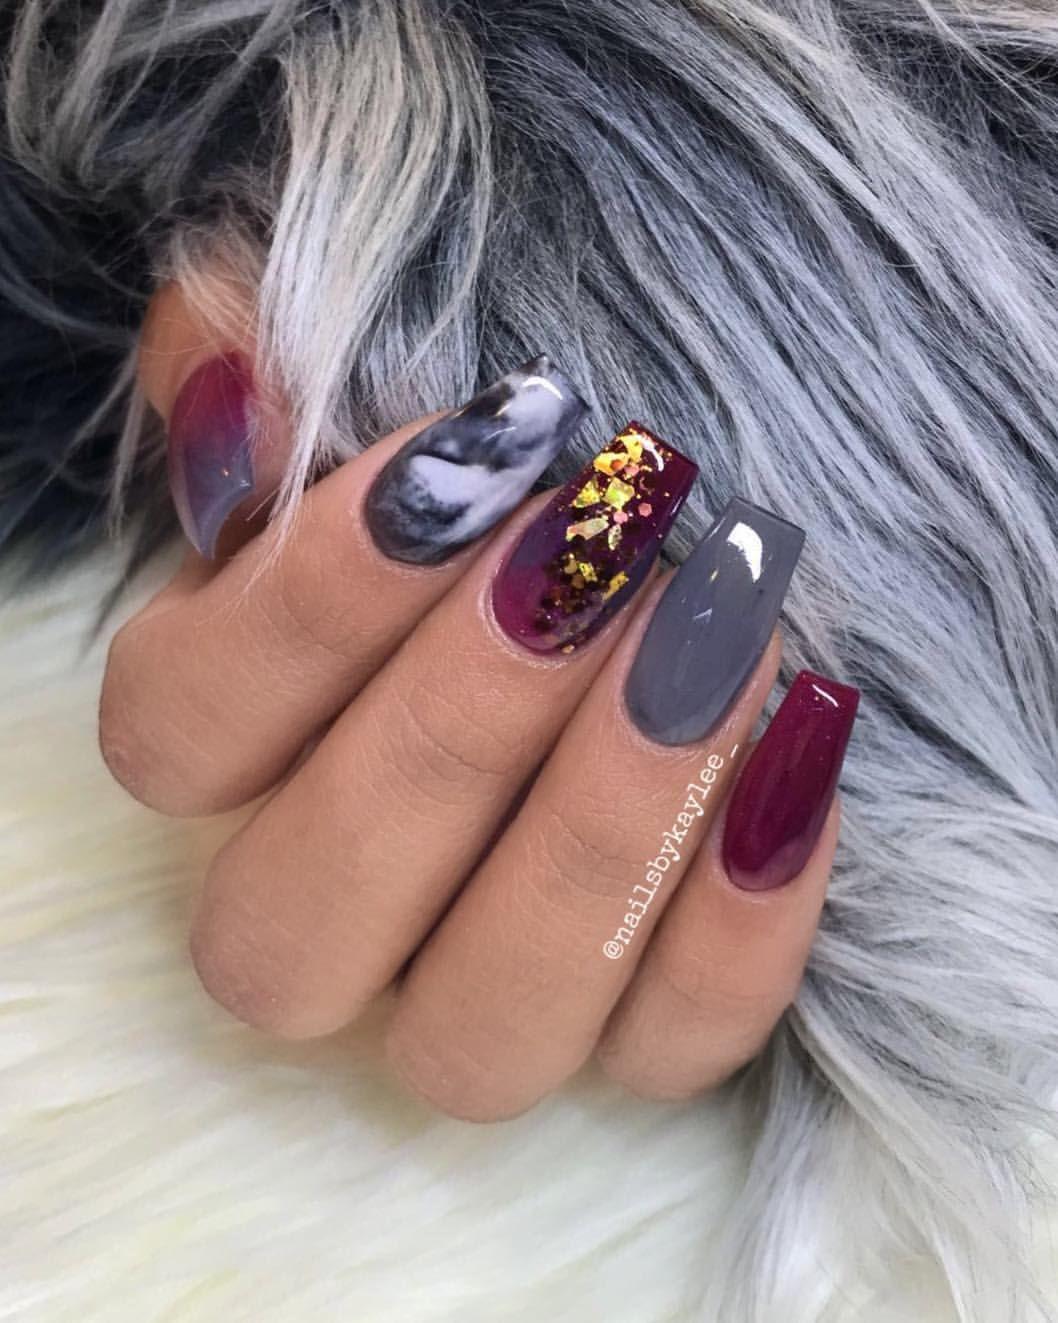 Klicensed nail technician nailsbykaylee_ instagram